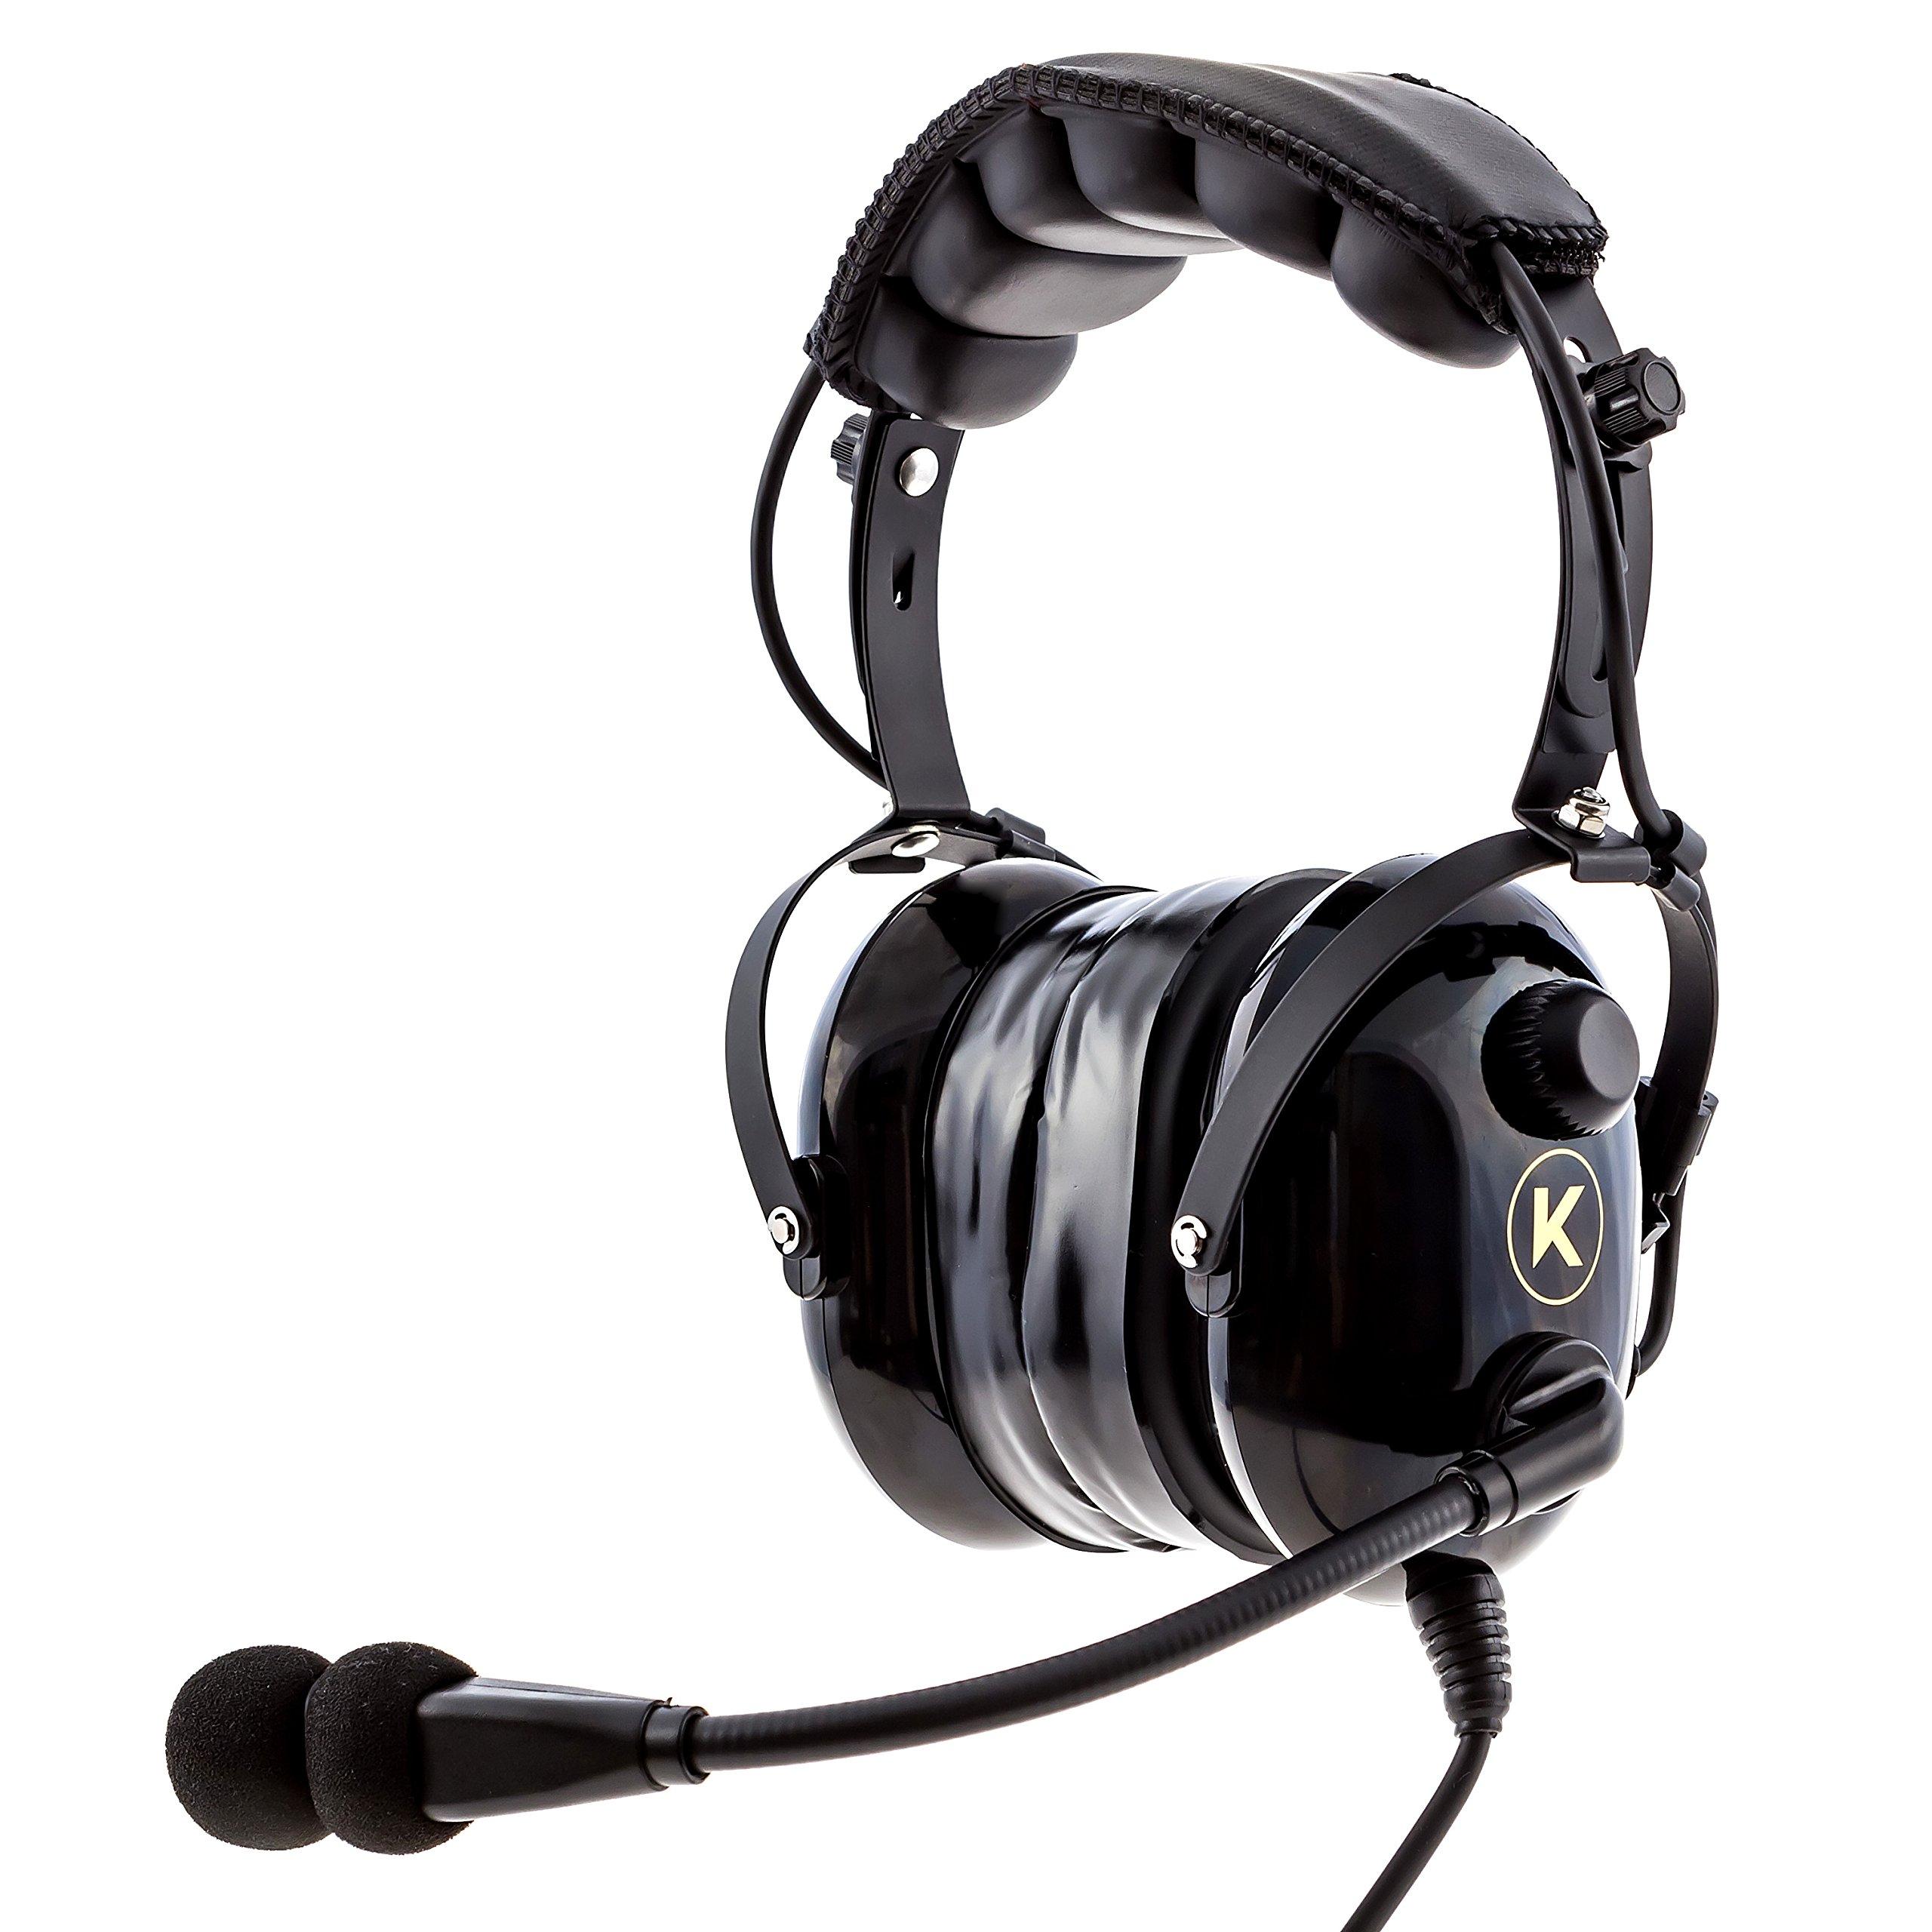 galleon kore aviation ka 1 premium gel ear seal pnr pilot aviation headset with mp3 support. Black Bedroom Furniture Sets. Home Design Ideas